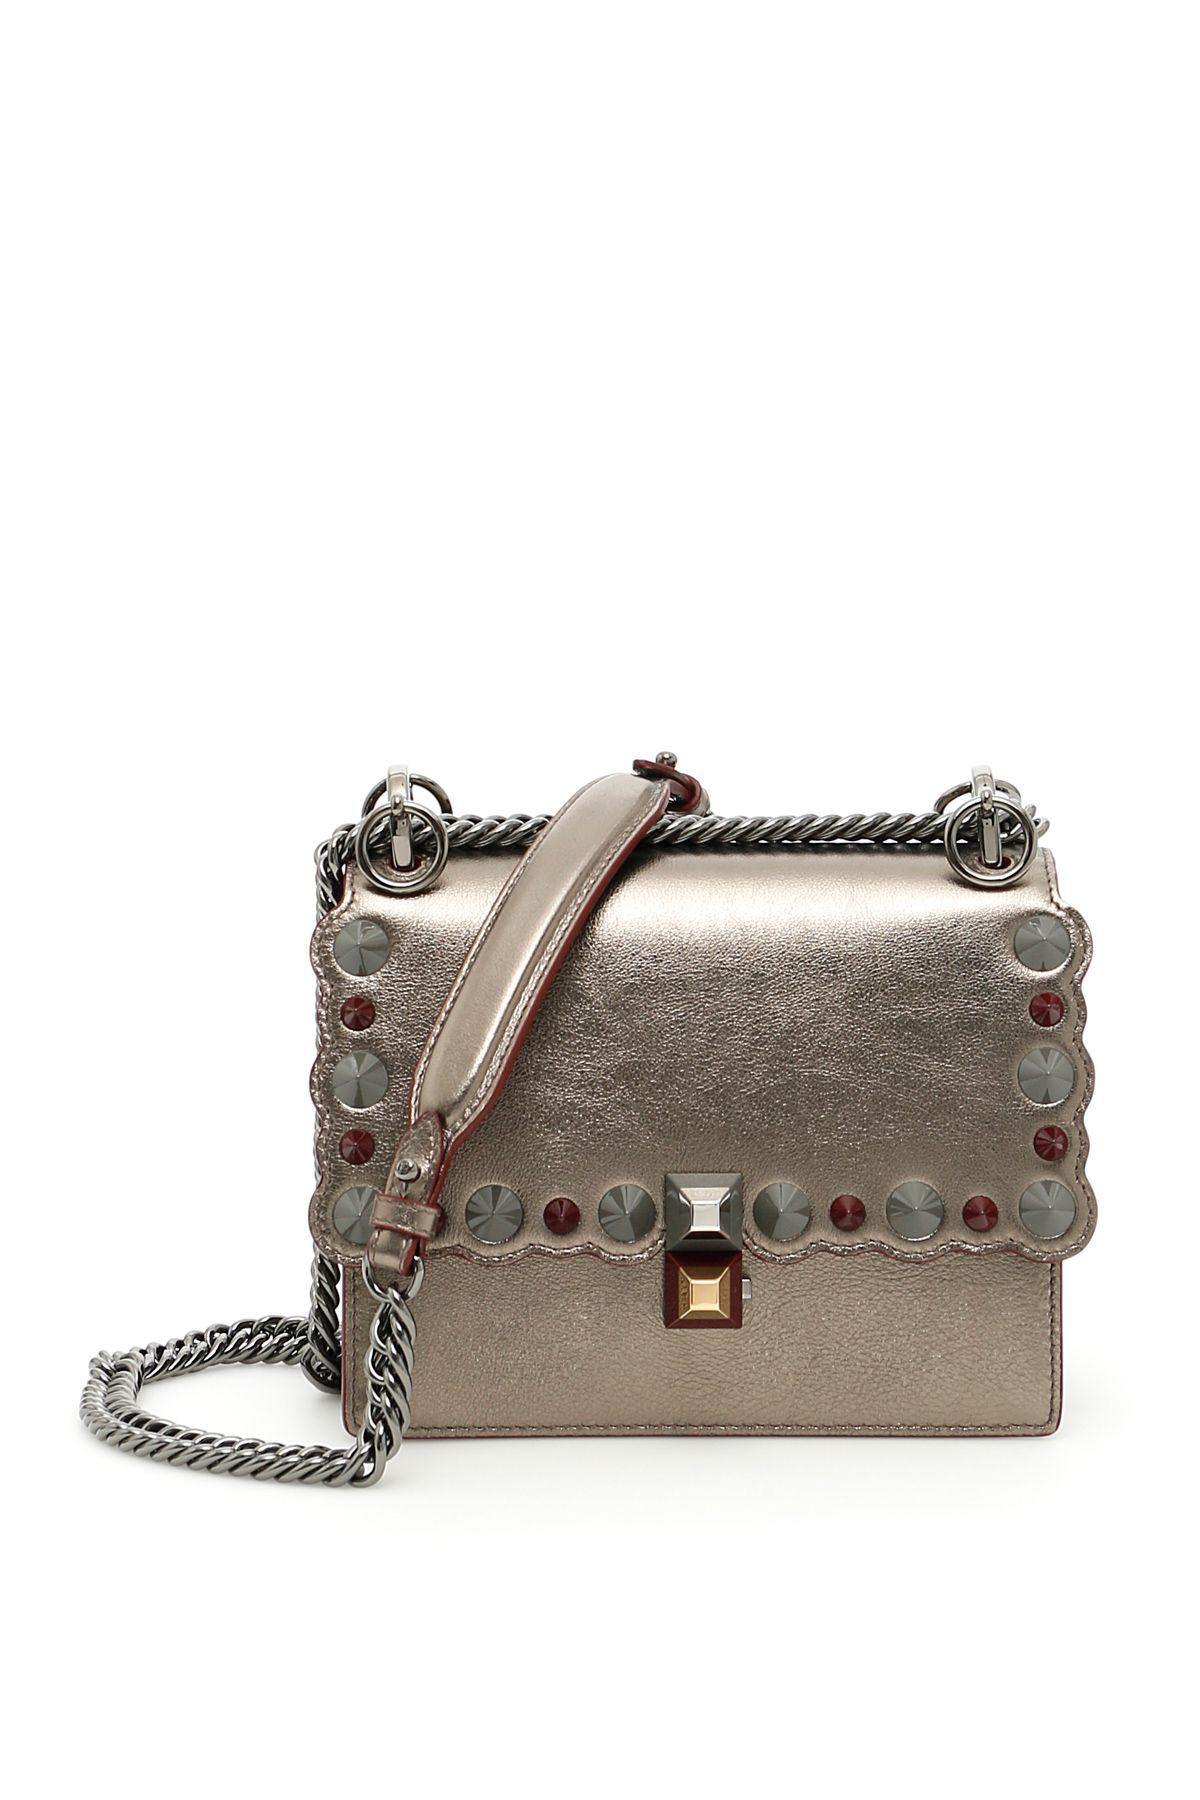 a3f730938266 Fendi Kan I Studded Bag